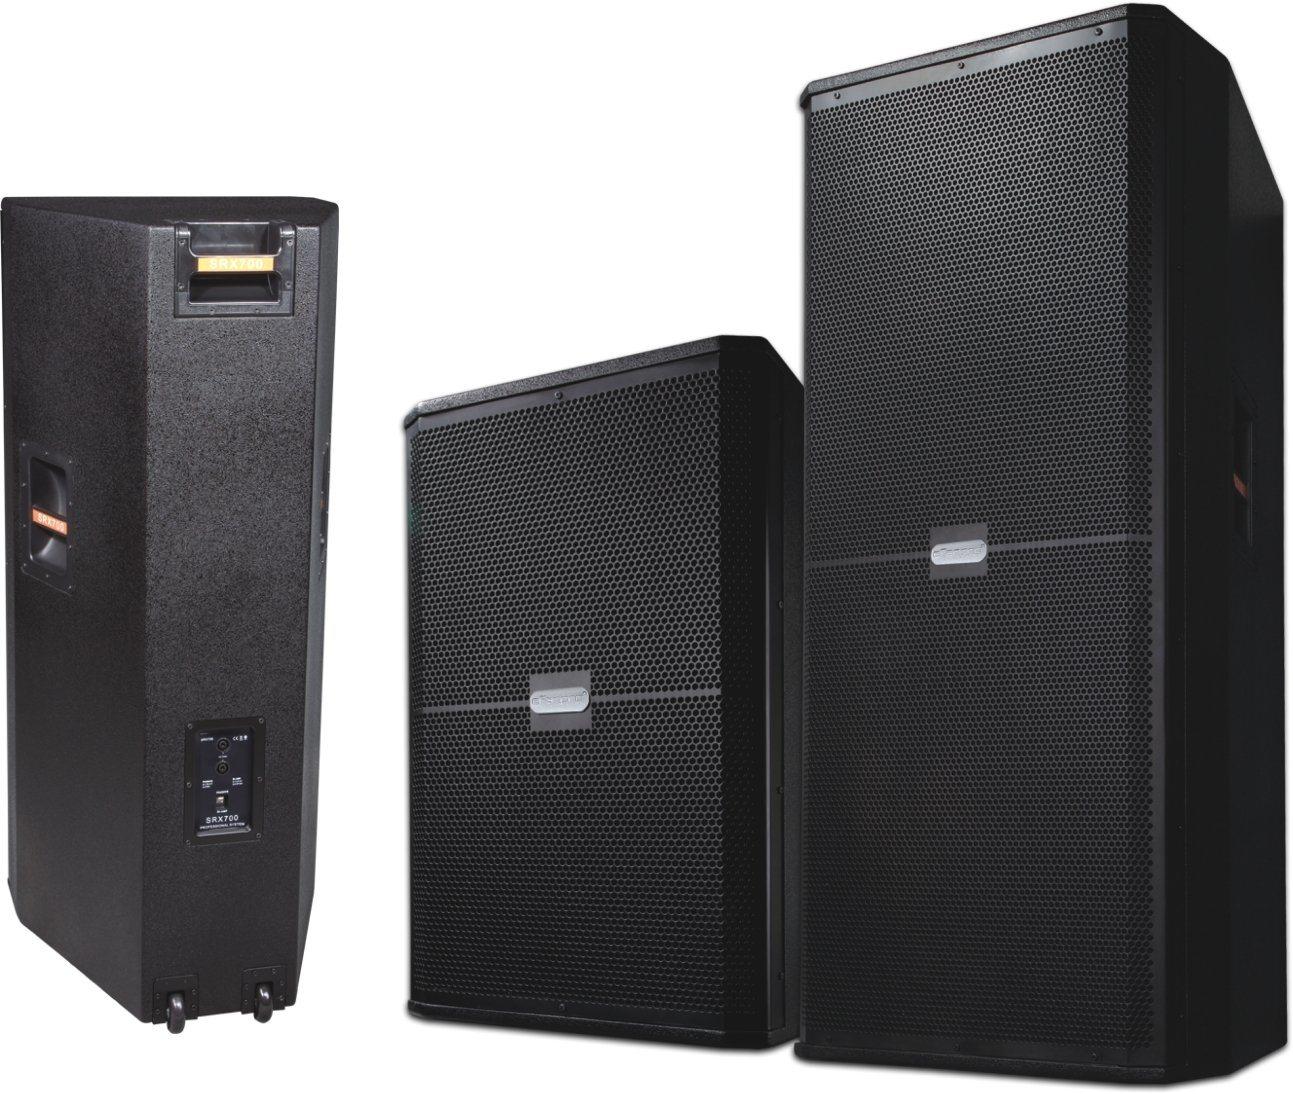 "2-Way 15"" Passive Floor Stage Monitor Speaker Cabinet System (SRX 715)"